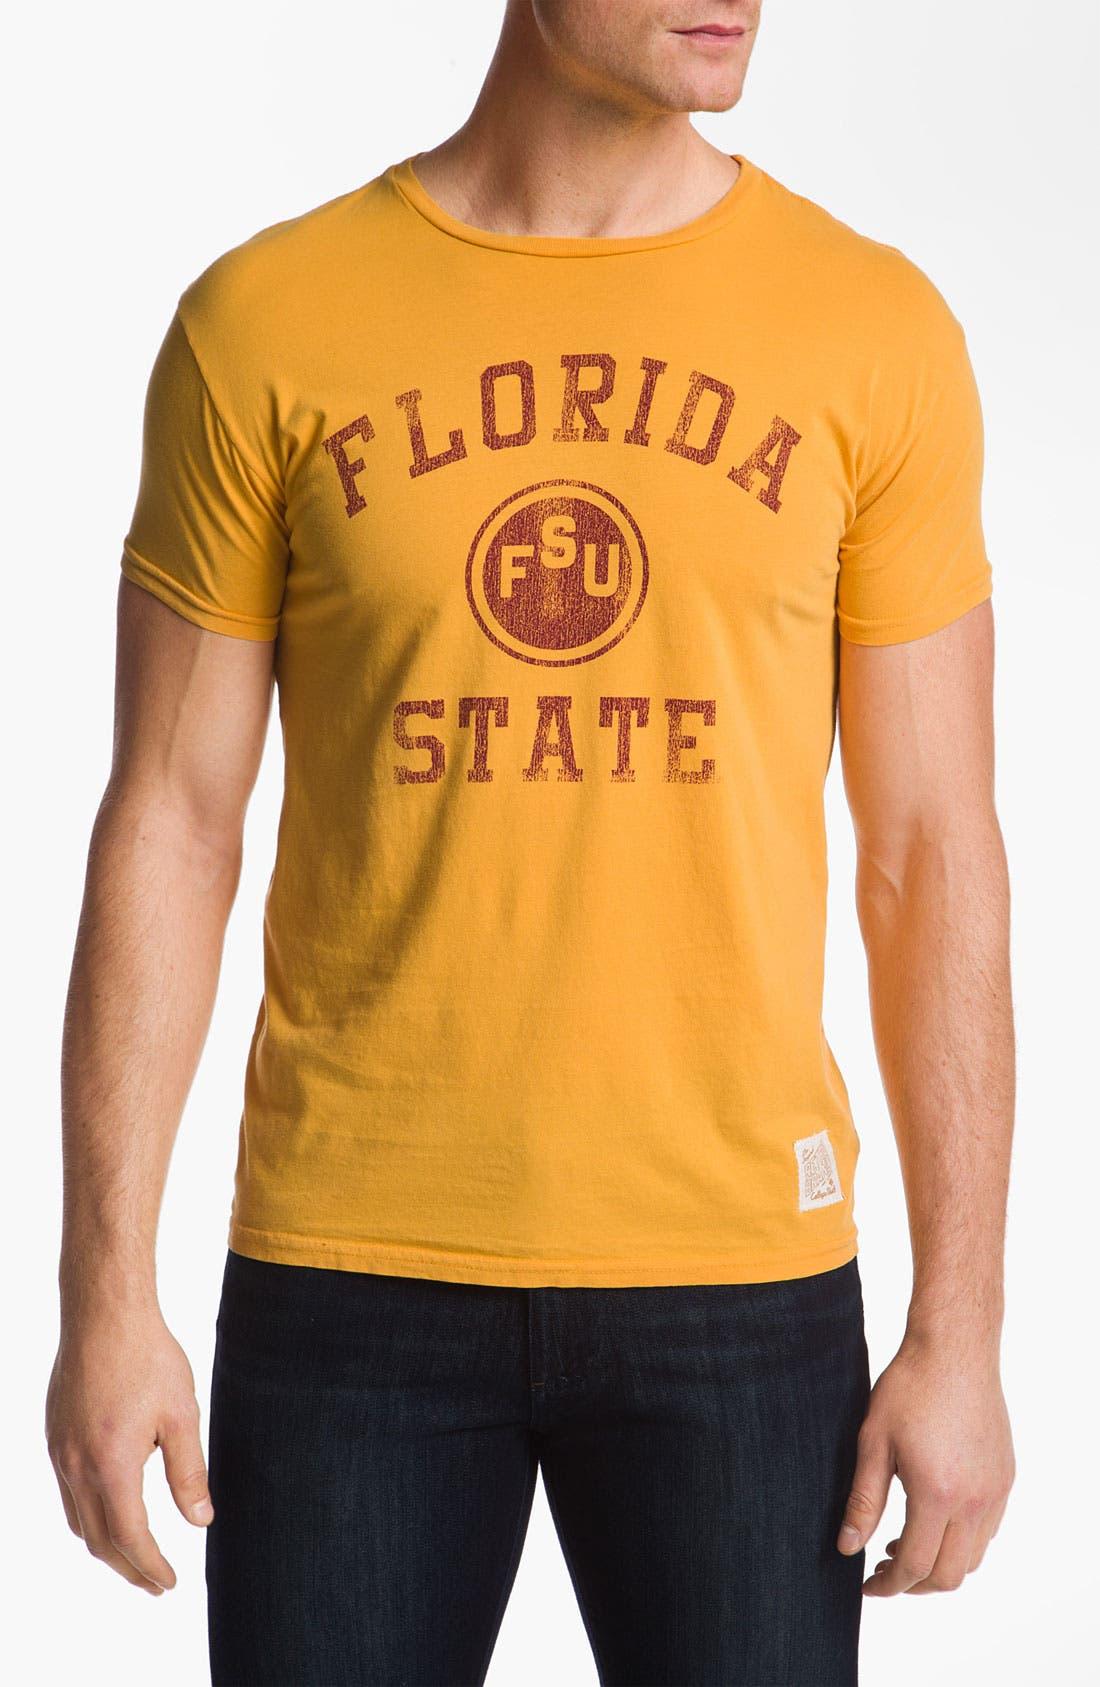 Alternate Image 1 Selected - The Original Retro Brand 'Florida State Seminoles' T-Shirt